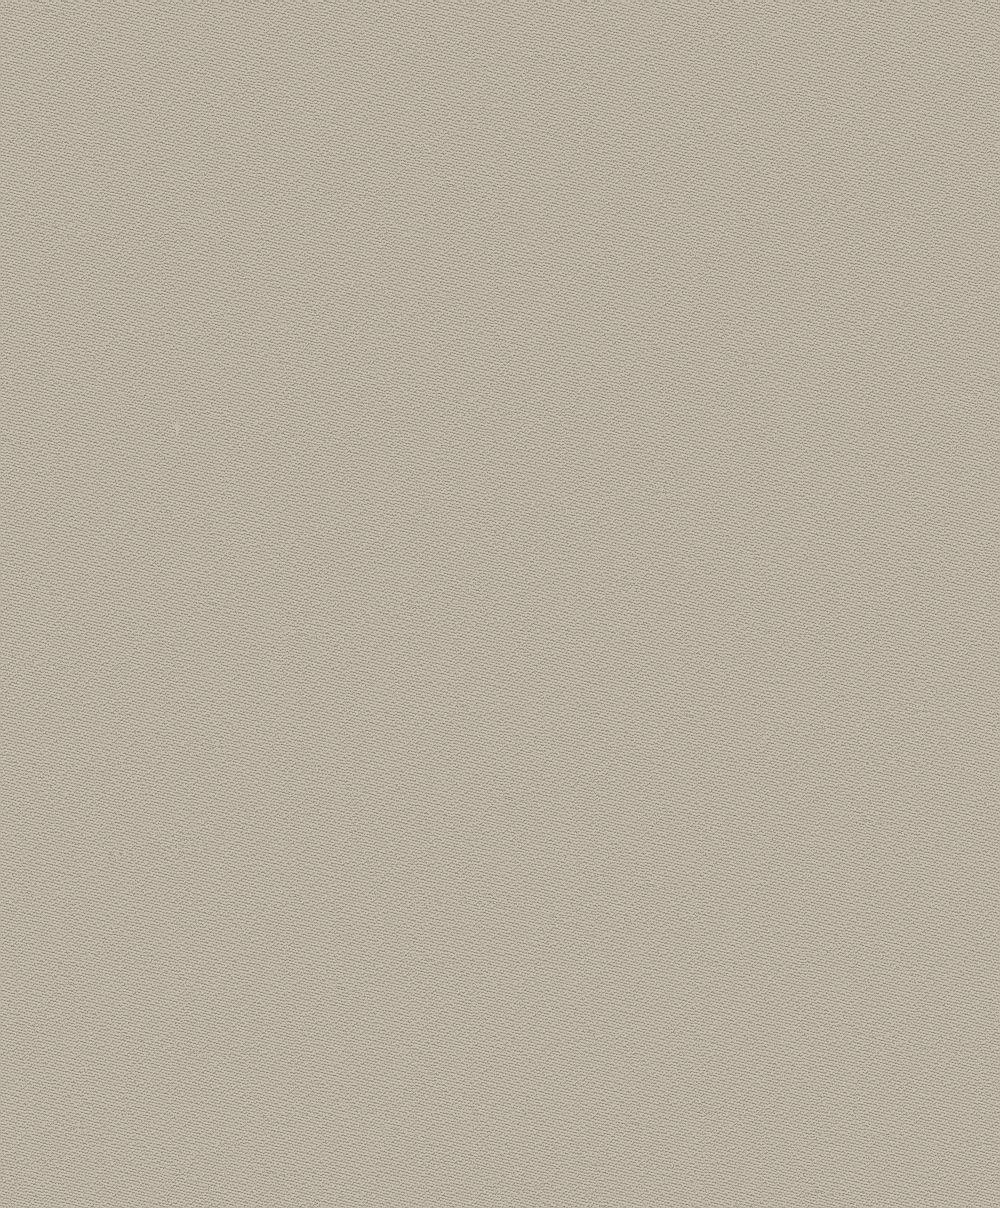 Albany Clara Texture Gilver Wallpaper - Product code: 35294